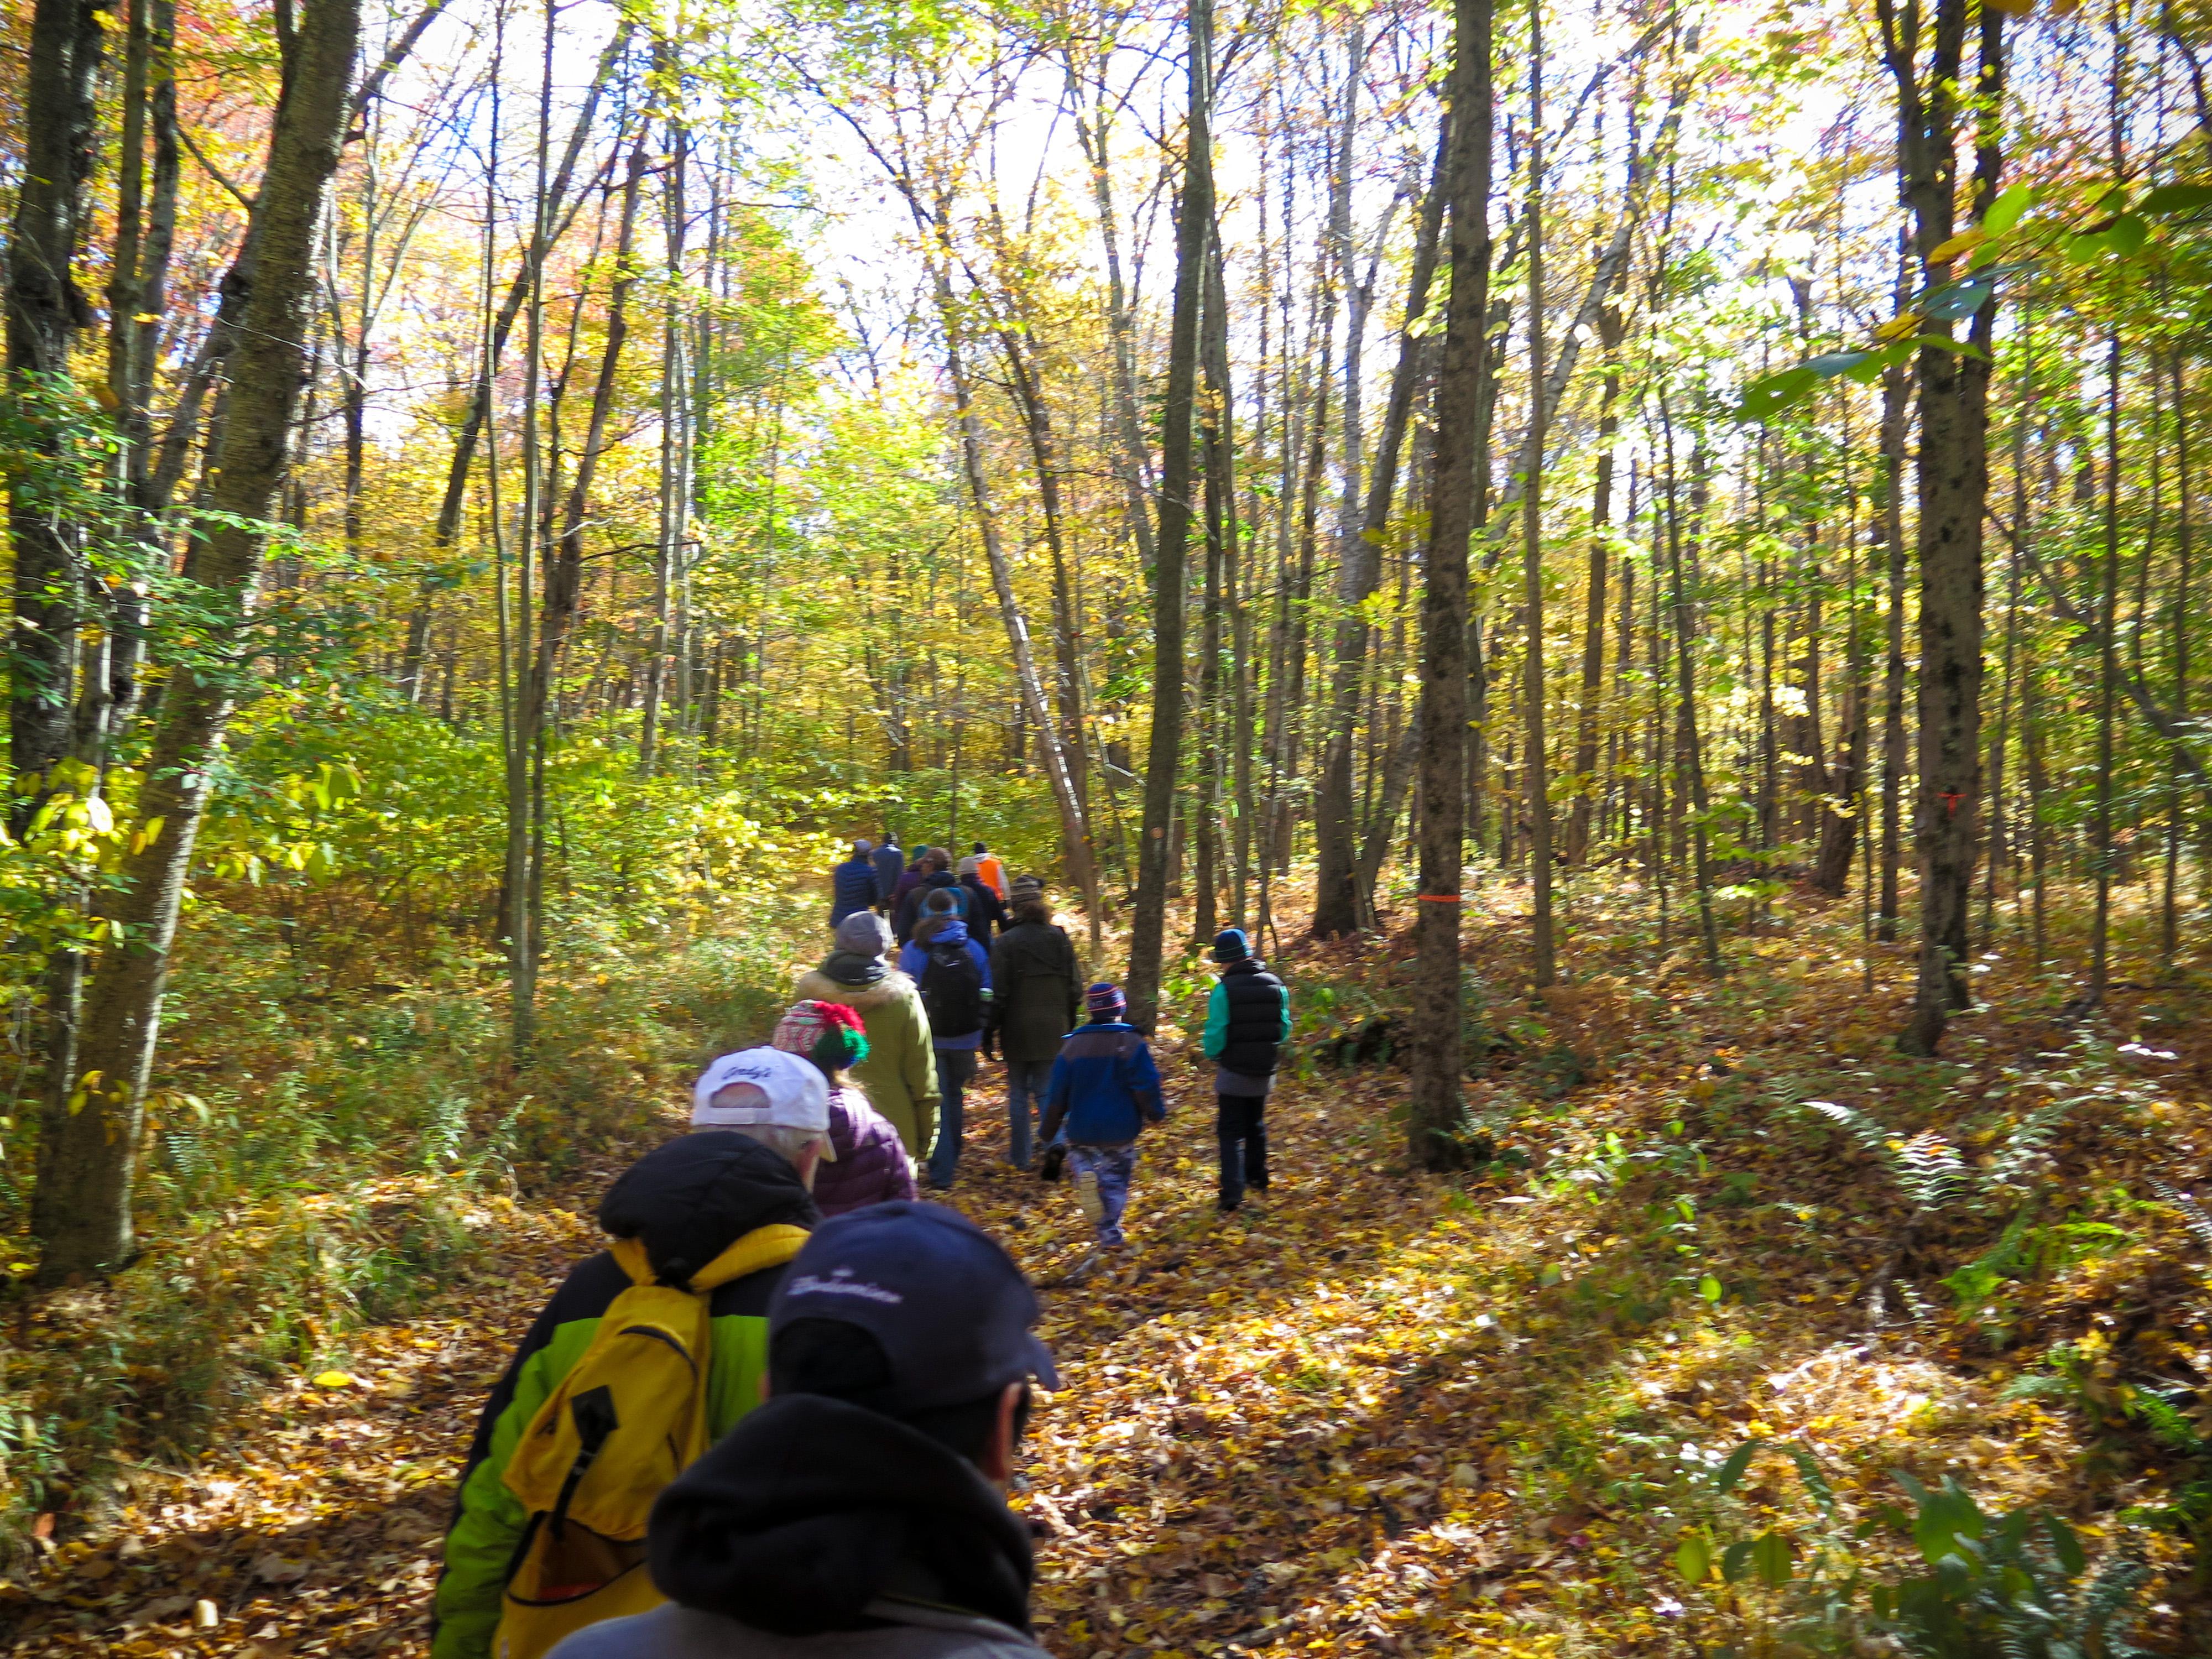 Hikers in the Tobin Preserve 2 Oct 2015 MCherniske